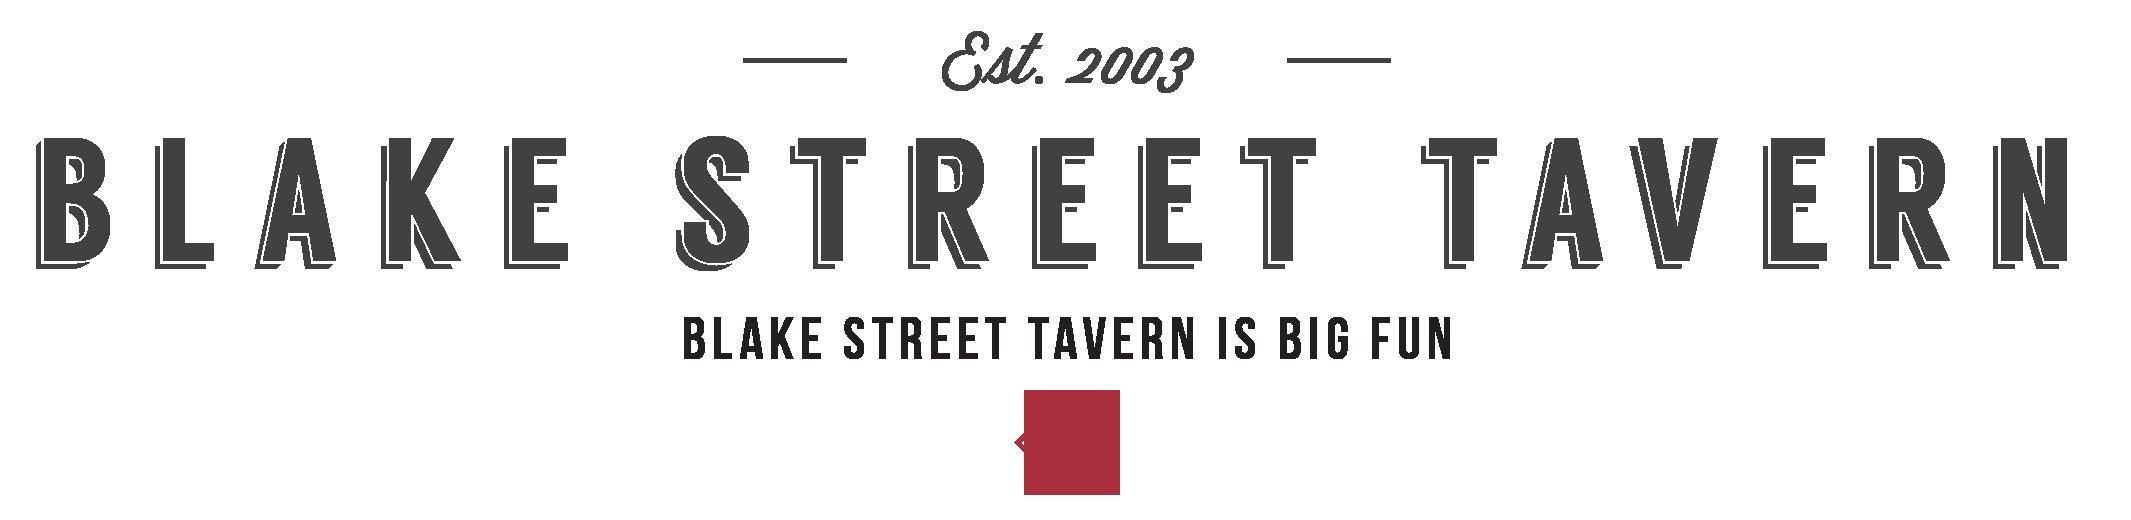 blakestreet.png